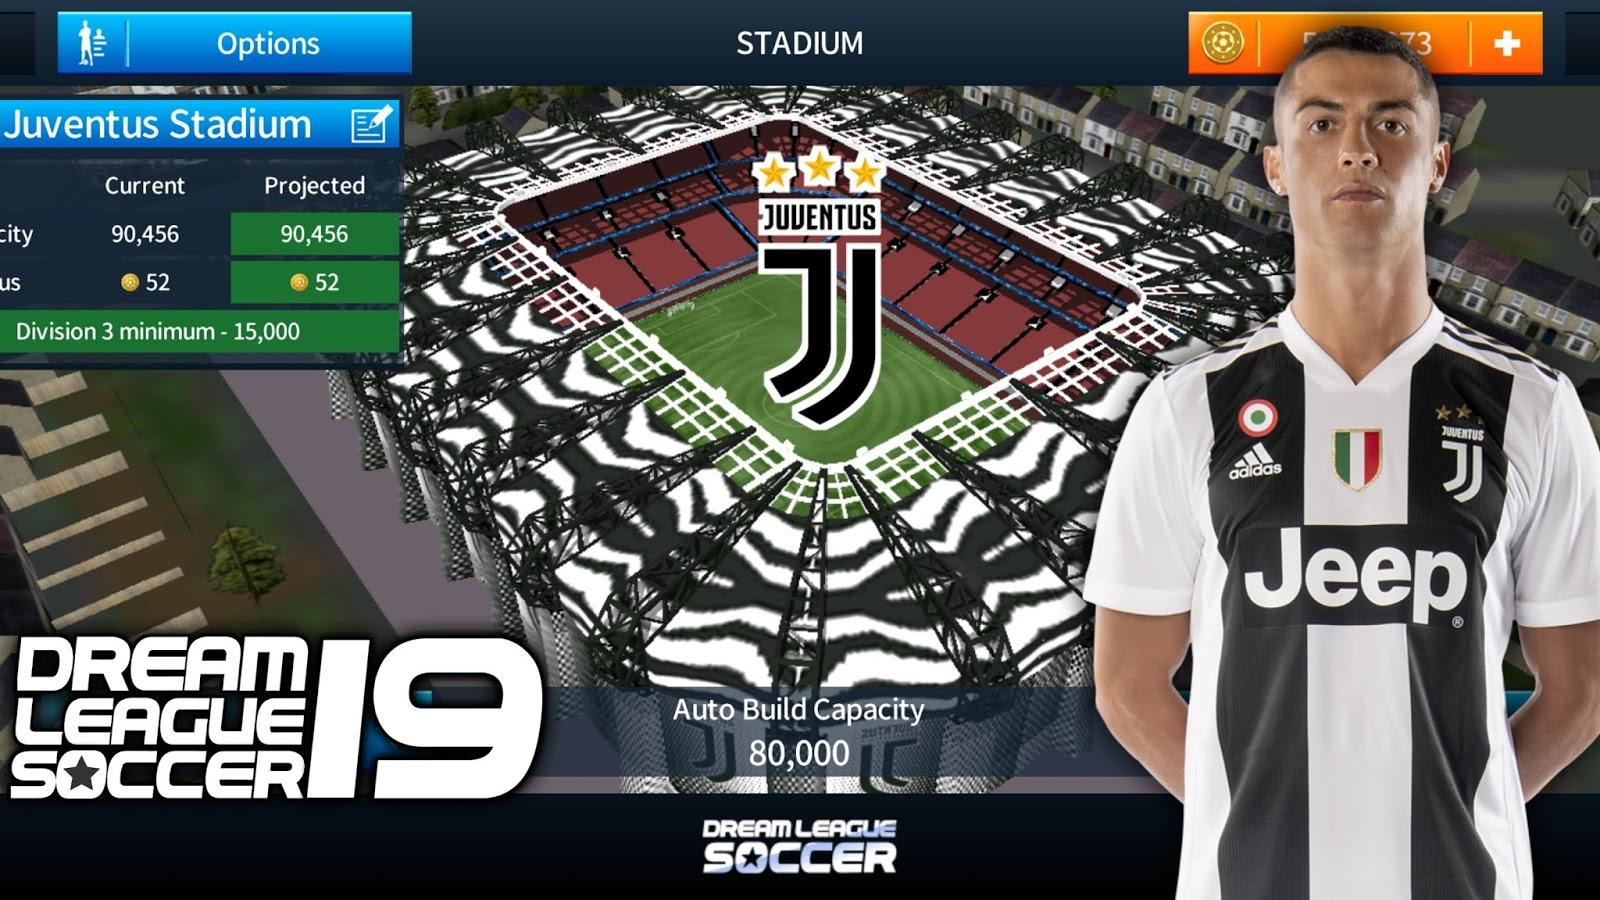 ef893b9700a How To Change The Stadium Of Dream League Soccer (Juventus Stadium)